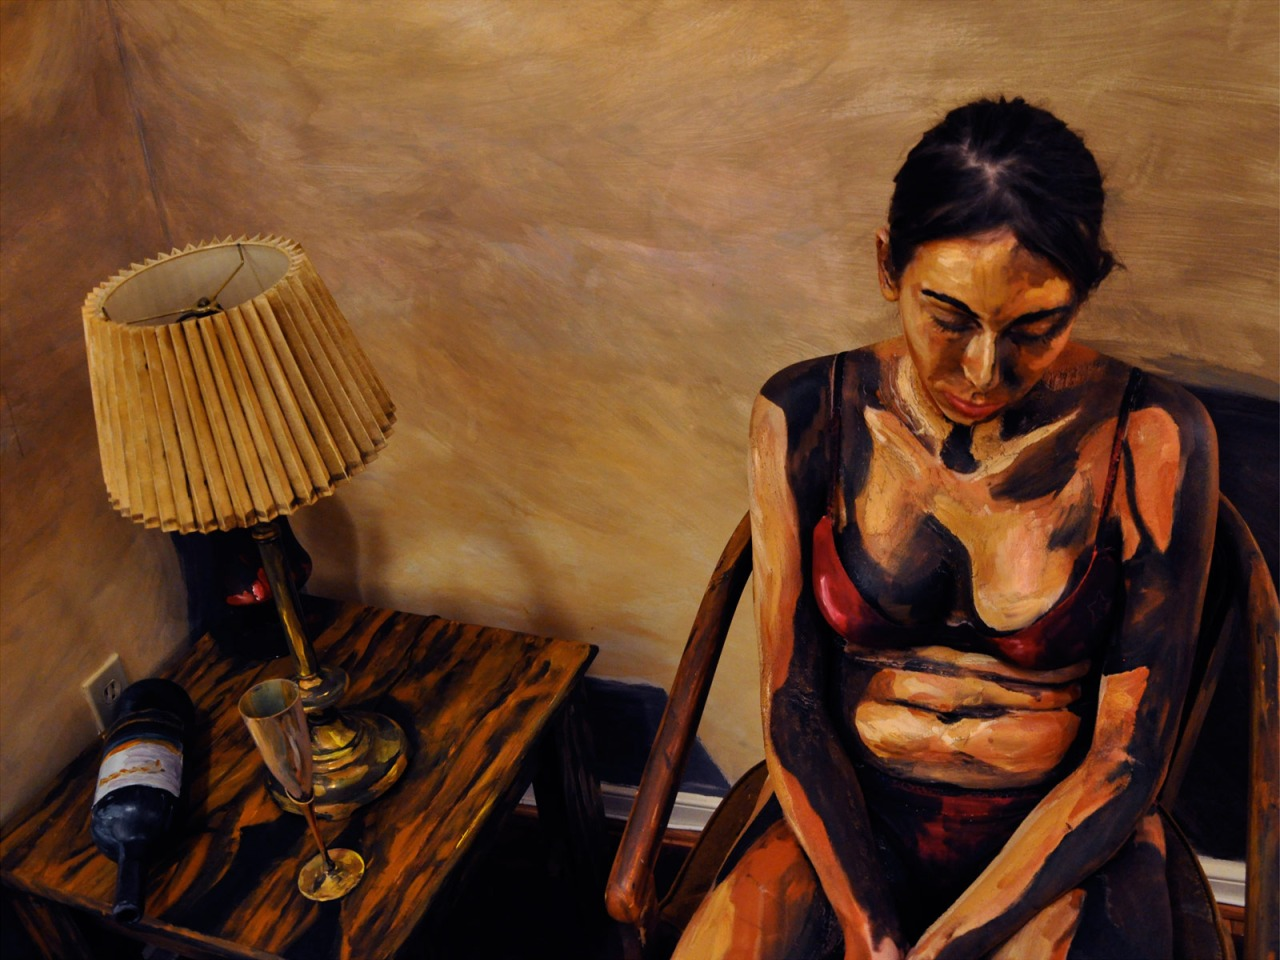 3D painting, Alea Meade280.jpg